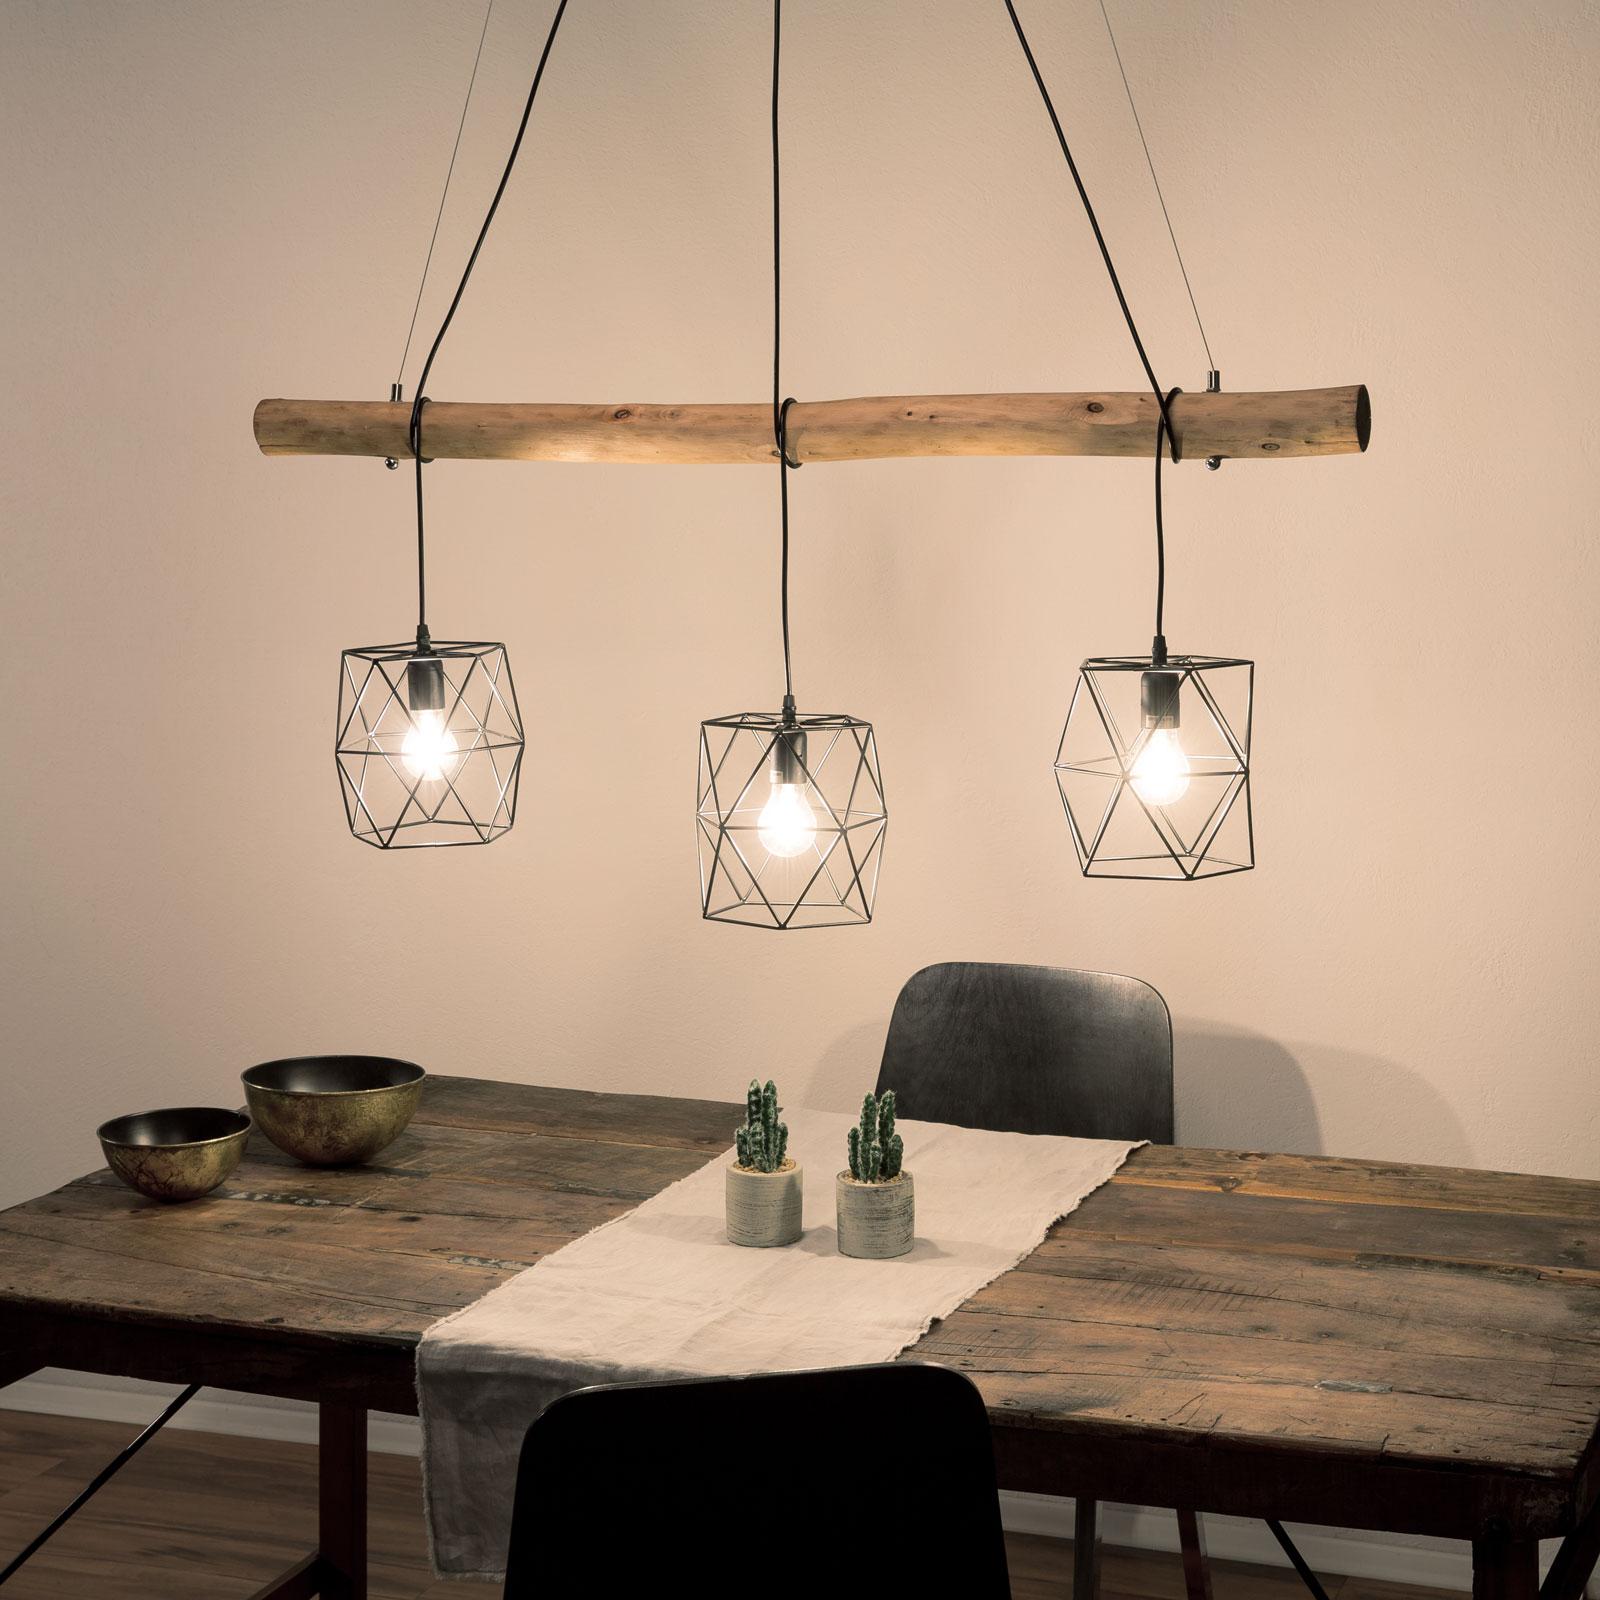 Vintage-hanglamp Edgar met houtbalken, 3-lamps